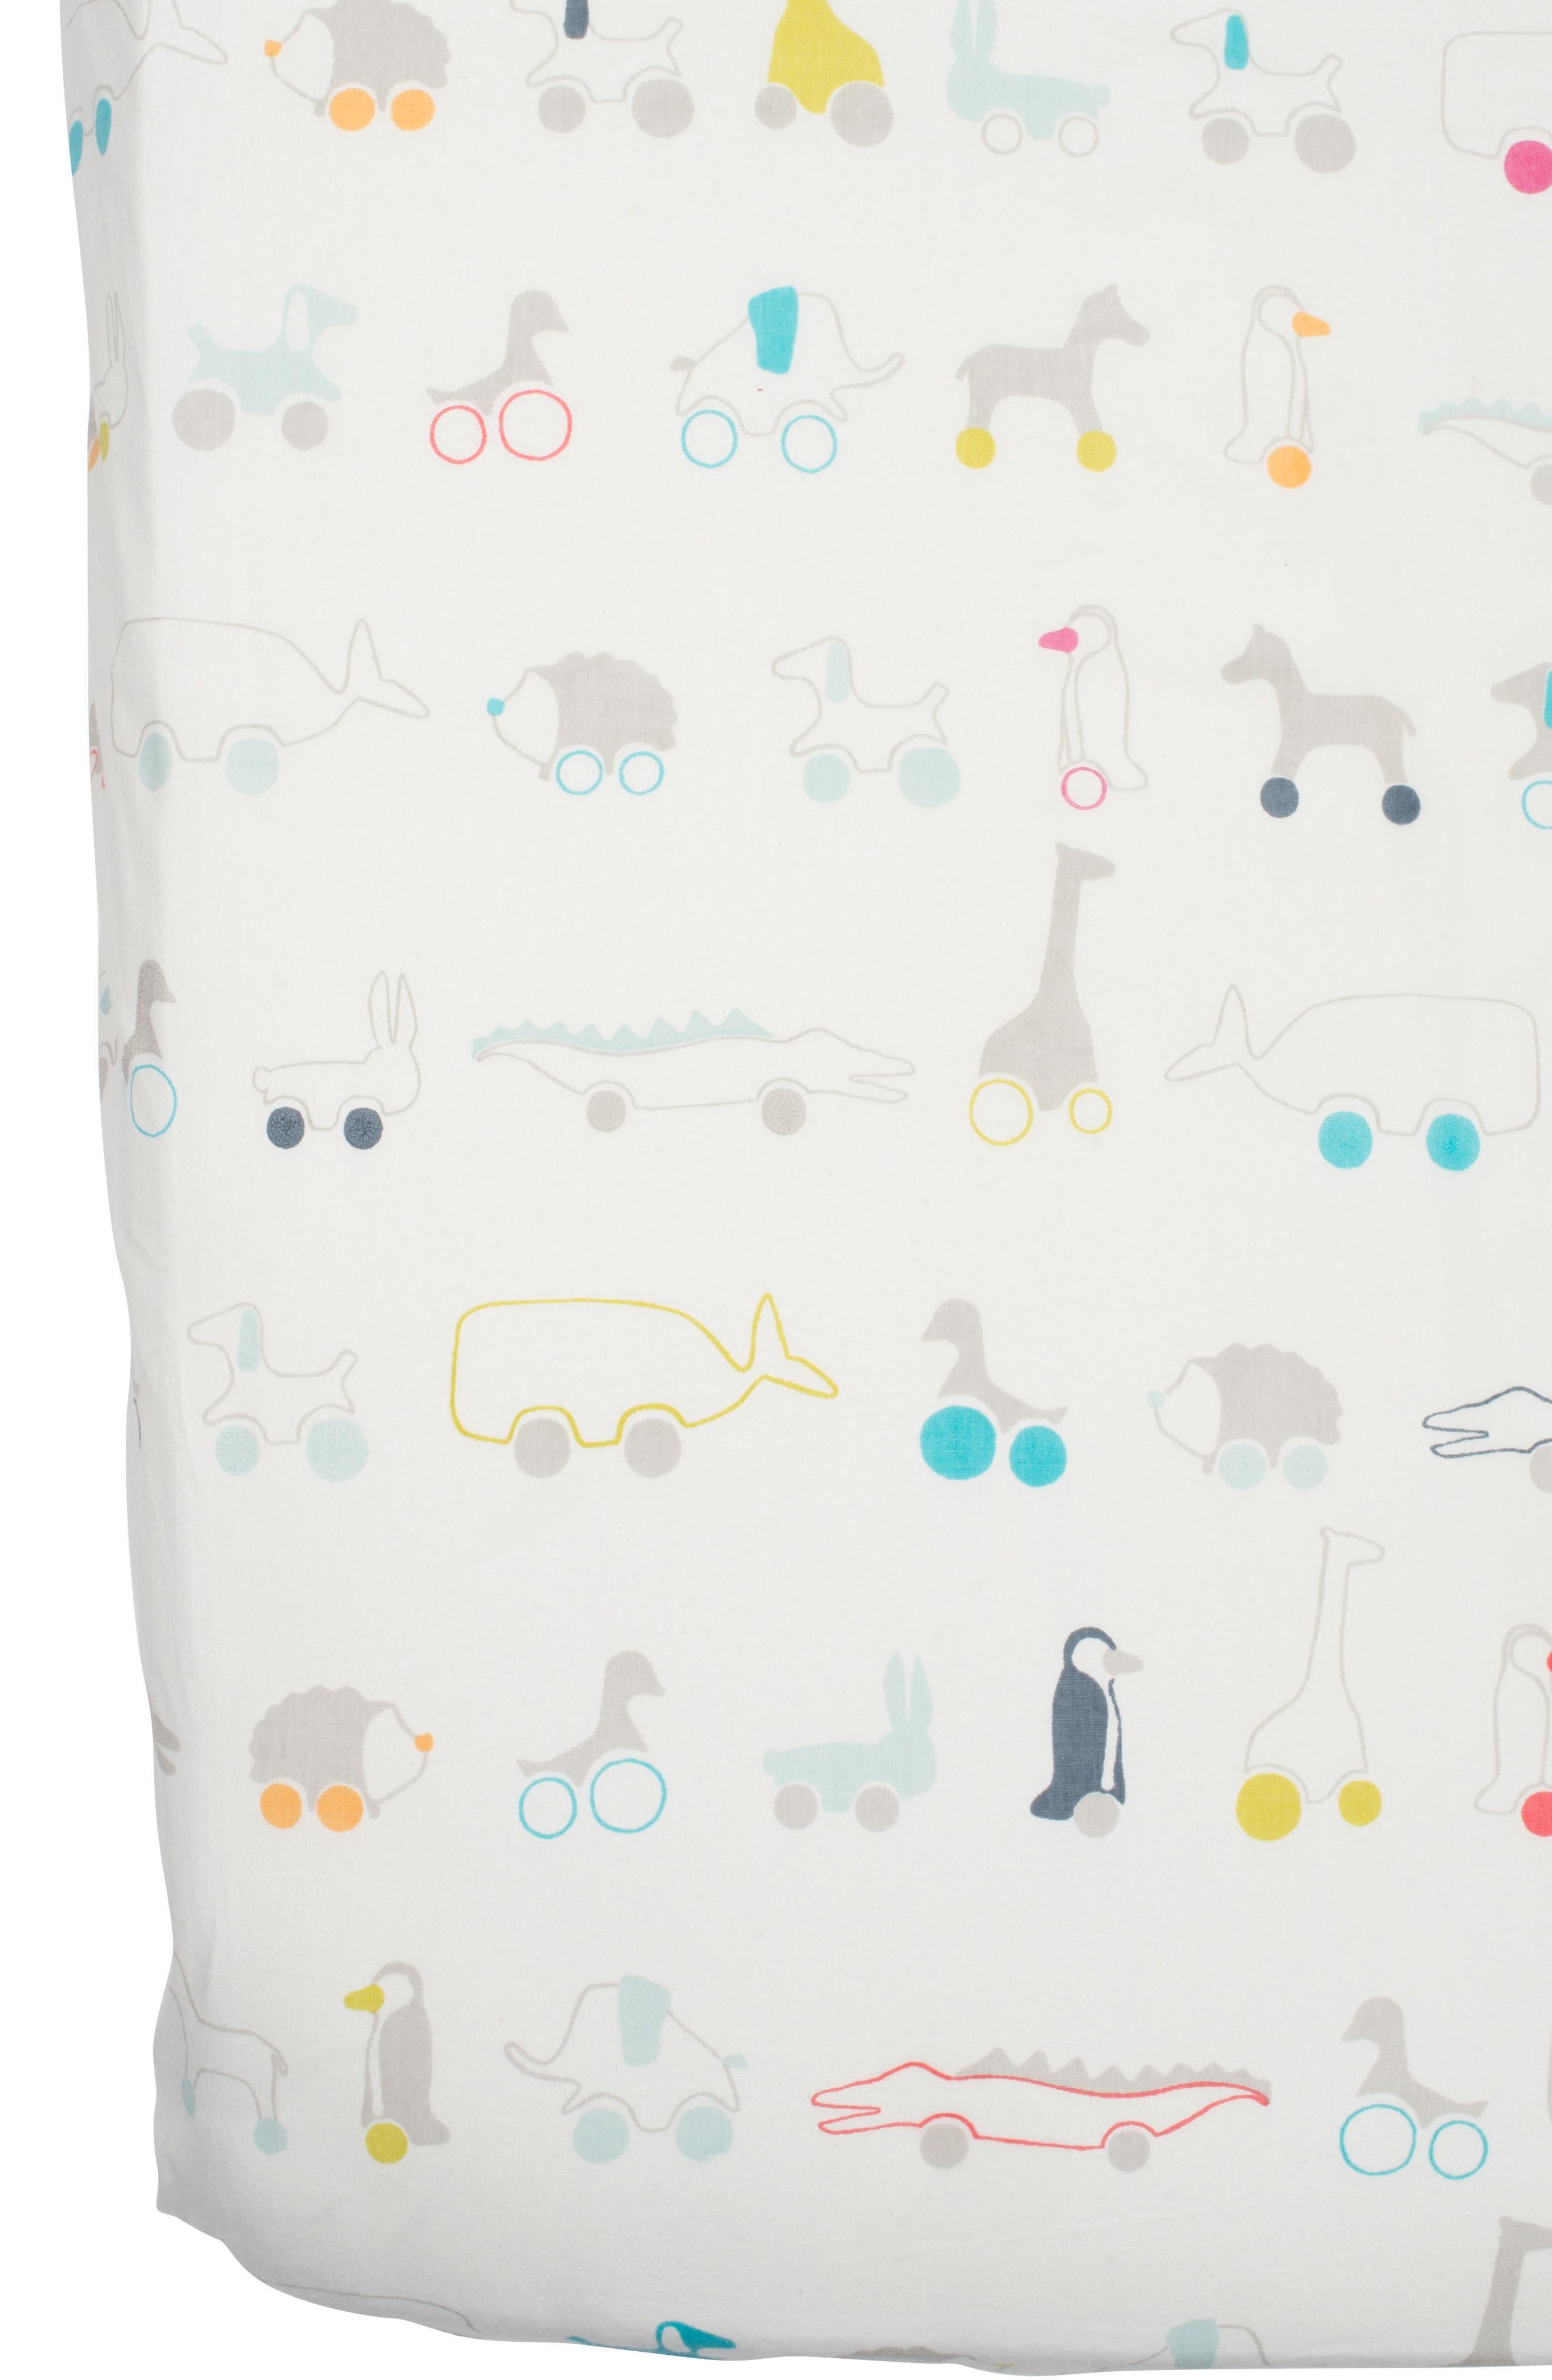 Pull Toys Crib Sheet,                         Main,                         color, MULTI